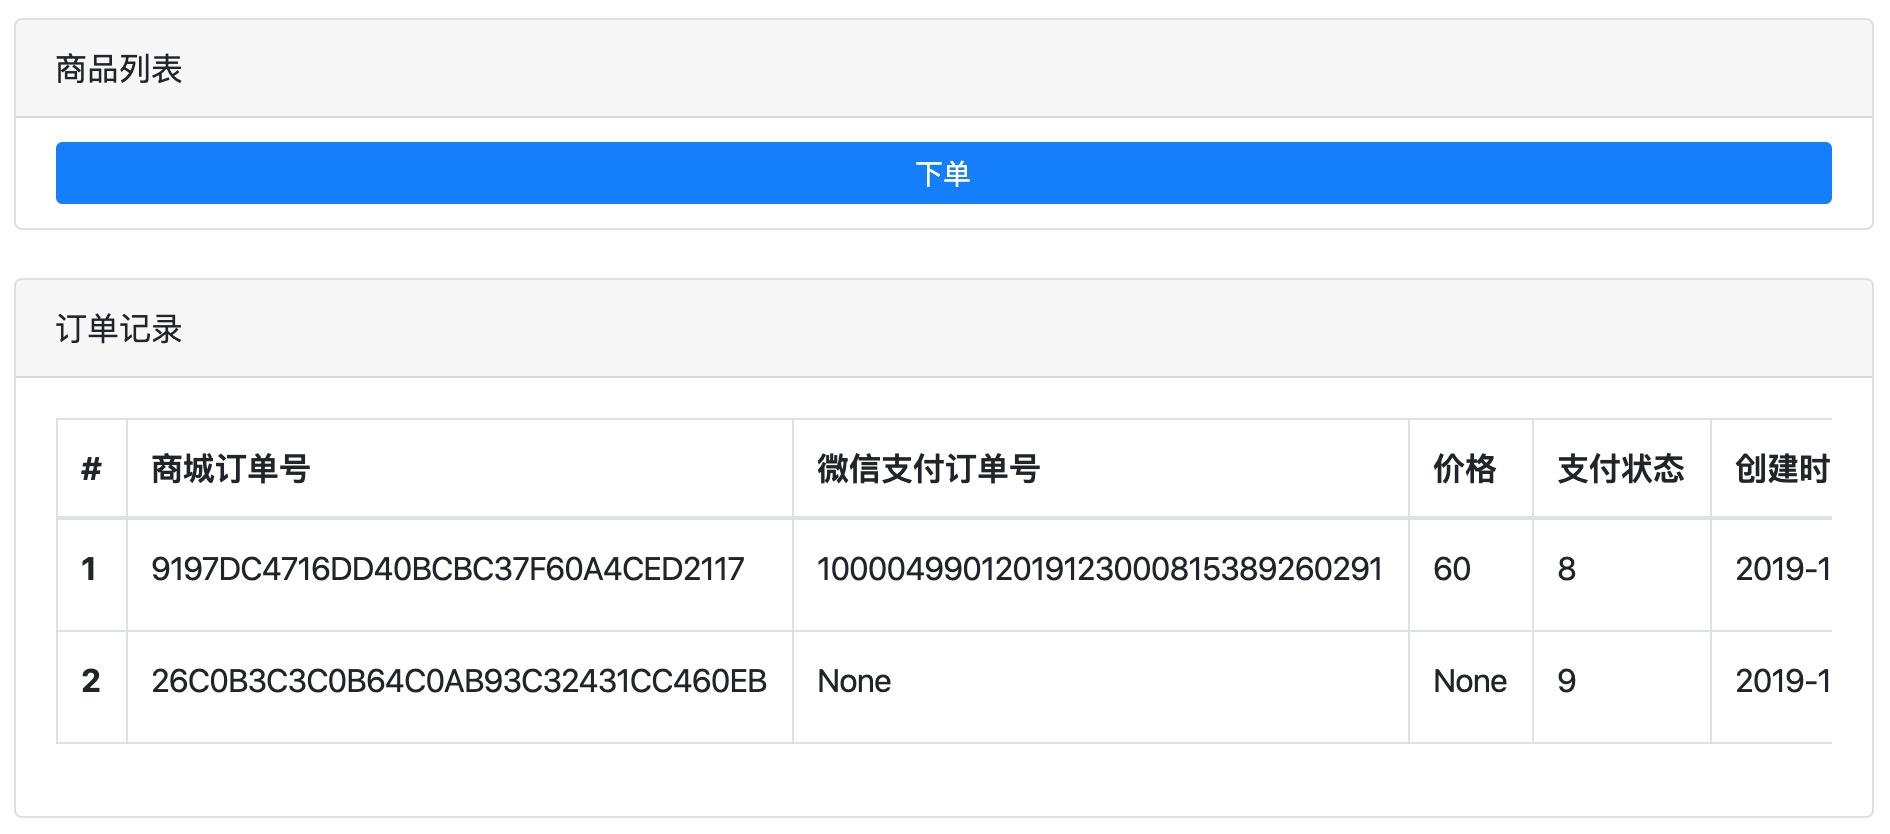 https://lsol-house-upload.oss-cn-hangzhou.aliyuncs.com/2019-12-30/8166120a-c129-4a86-b59f-4e336f781292.png